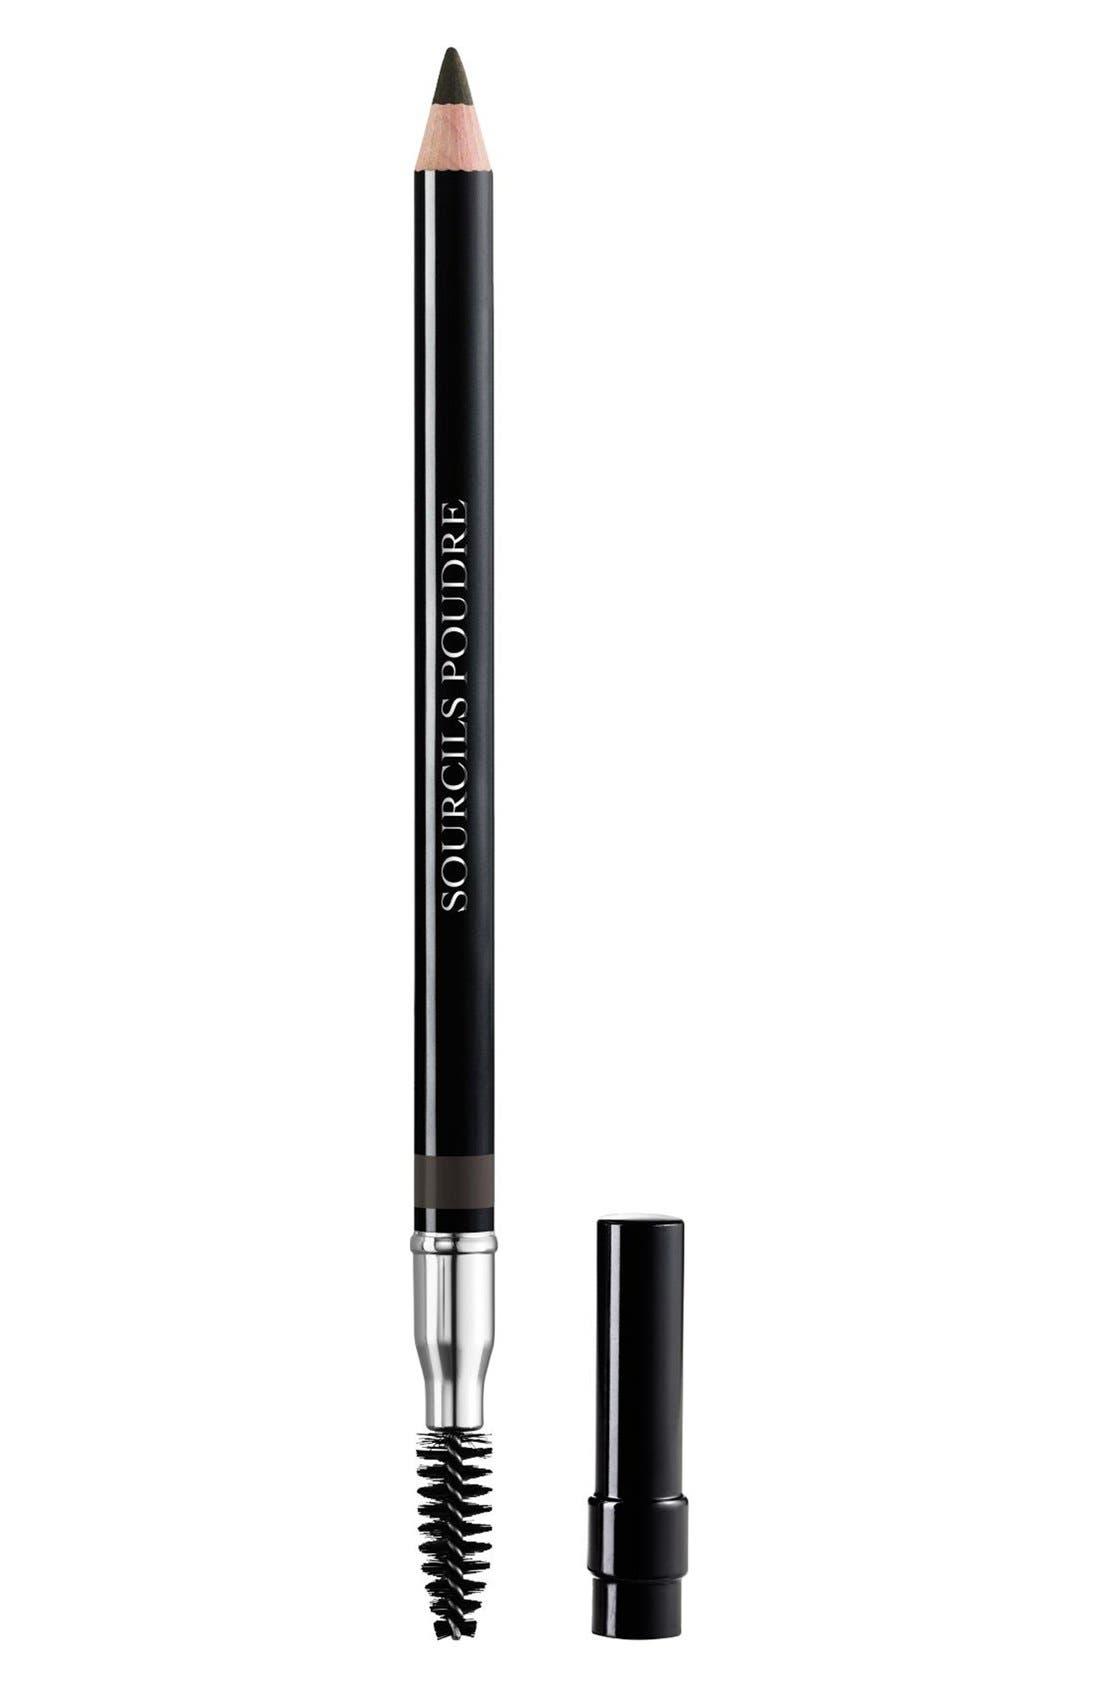 Dior 'Sourcils Poudre' Powder Eyebrow Pencil